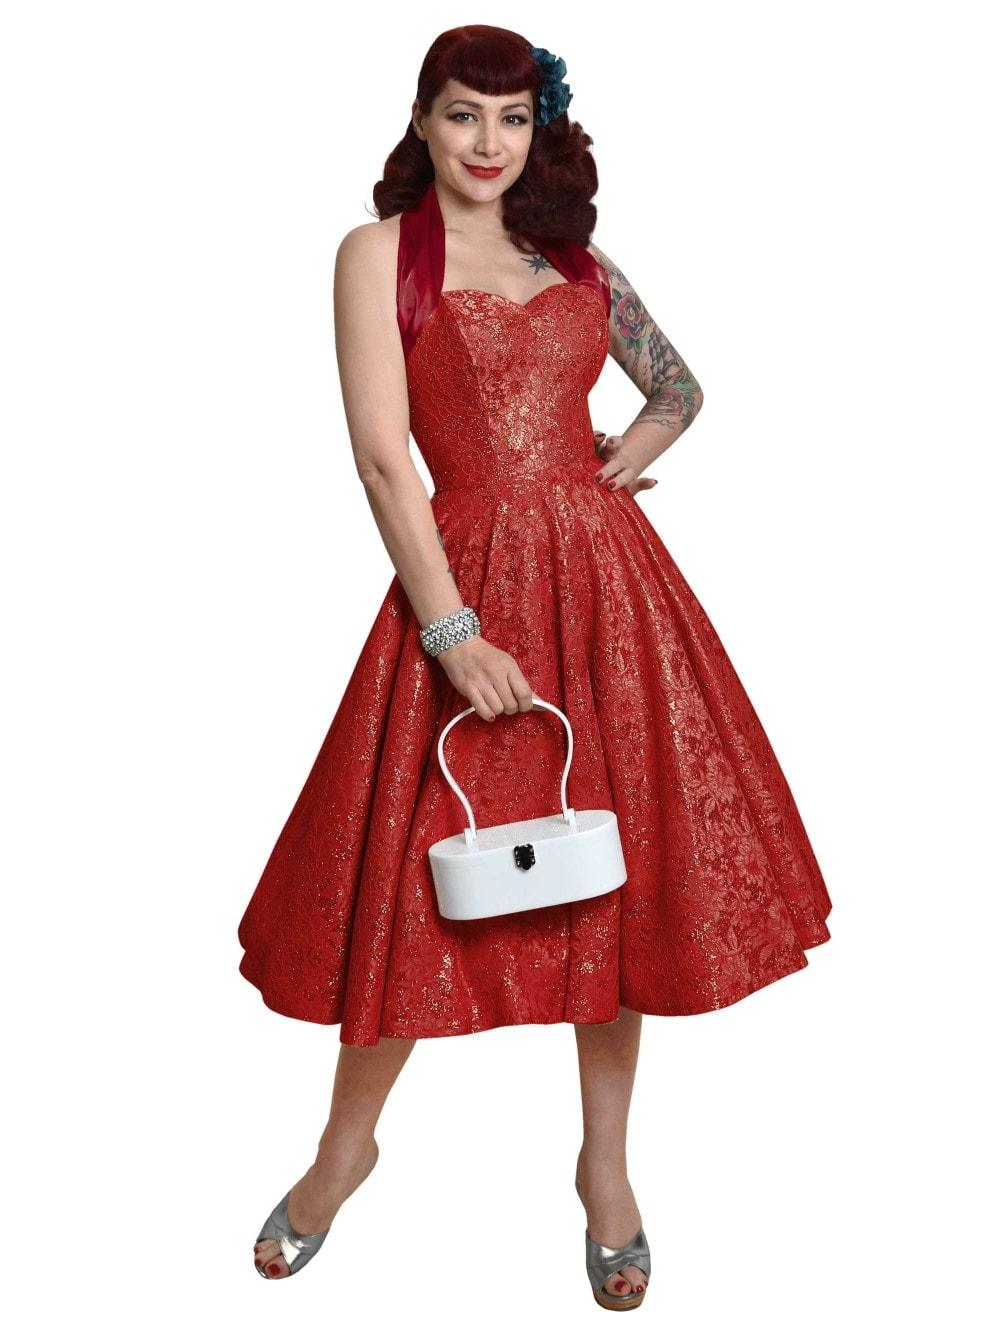 252bbc64 1950s Halterneck Ruby Sparkle Dress from Vivien of Holloway